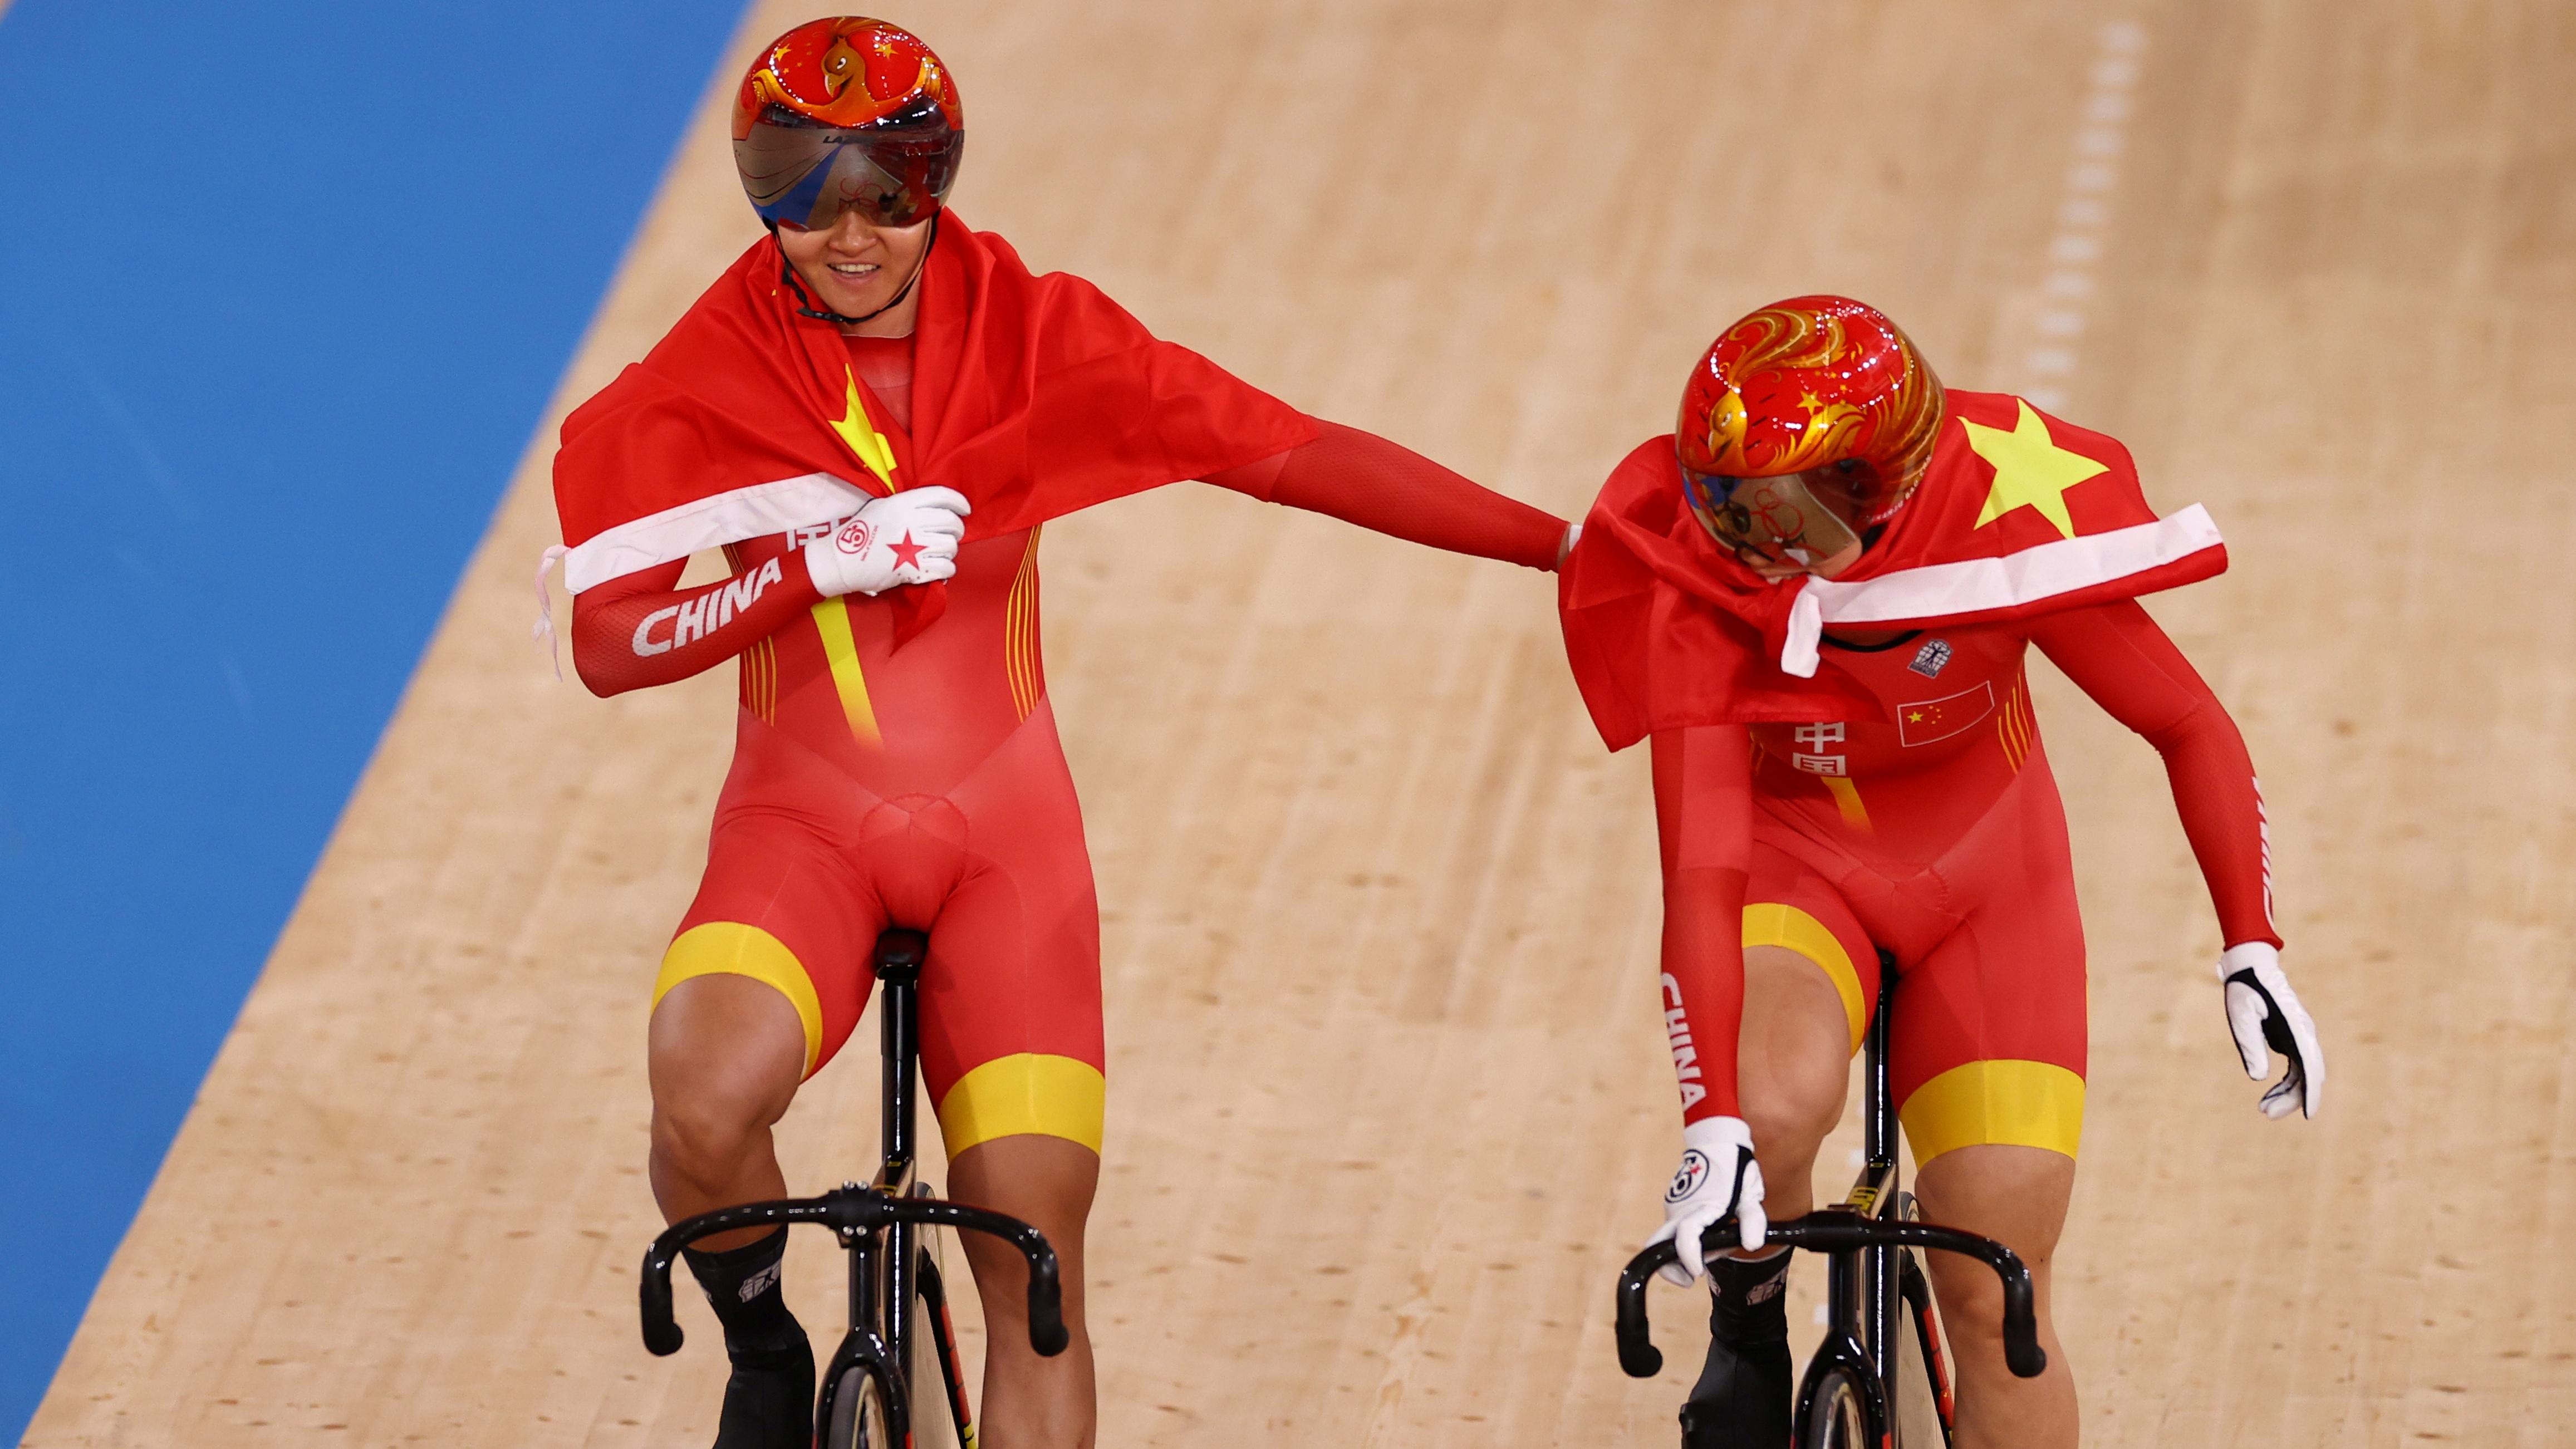 Tokyo 2020 Olympics - Cycling - Track - Women's Team Sprint - Gold Final - Izu Velodrome, Shizuoka, Japan - August 2, 2021. Bao Shanju of China and Zhong Tianshi of China celebrate winning the race and the gold medal. REUTERS/Kacper Pempel